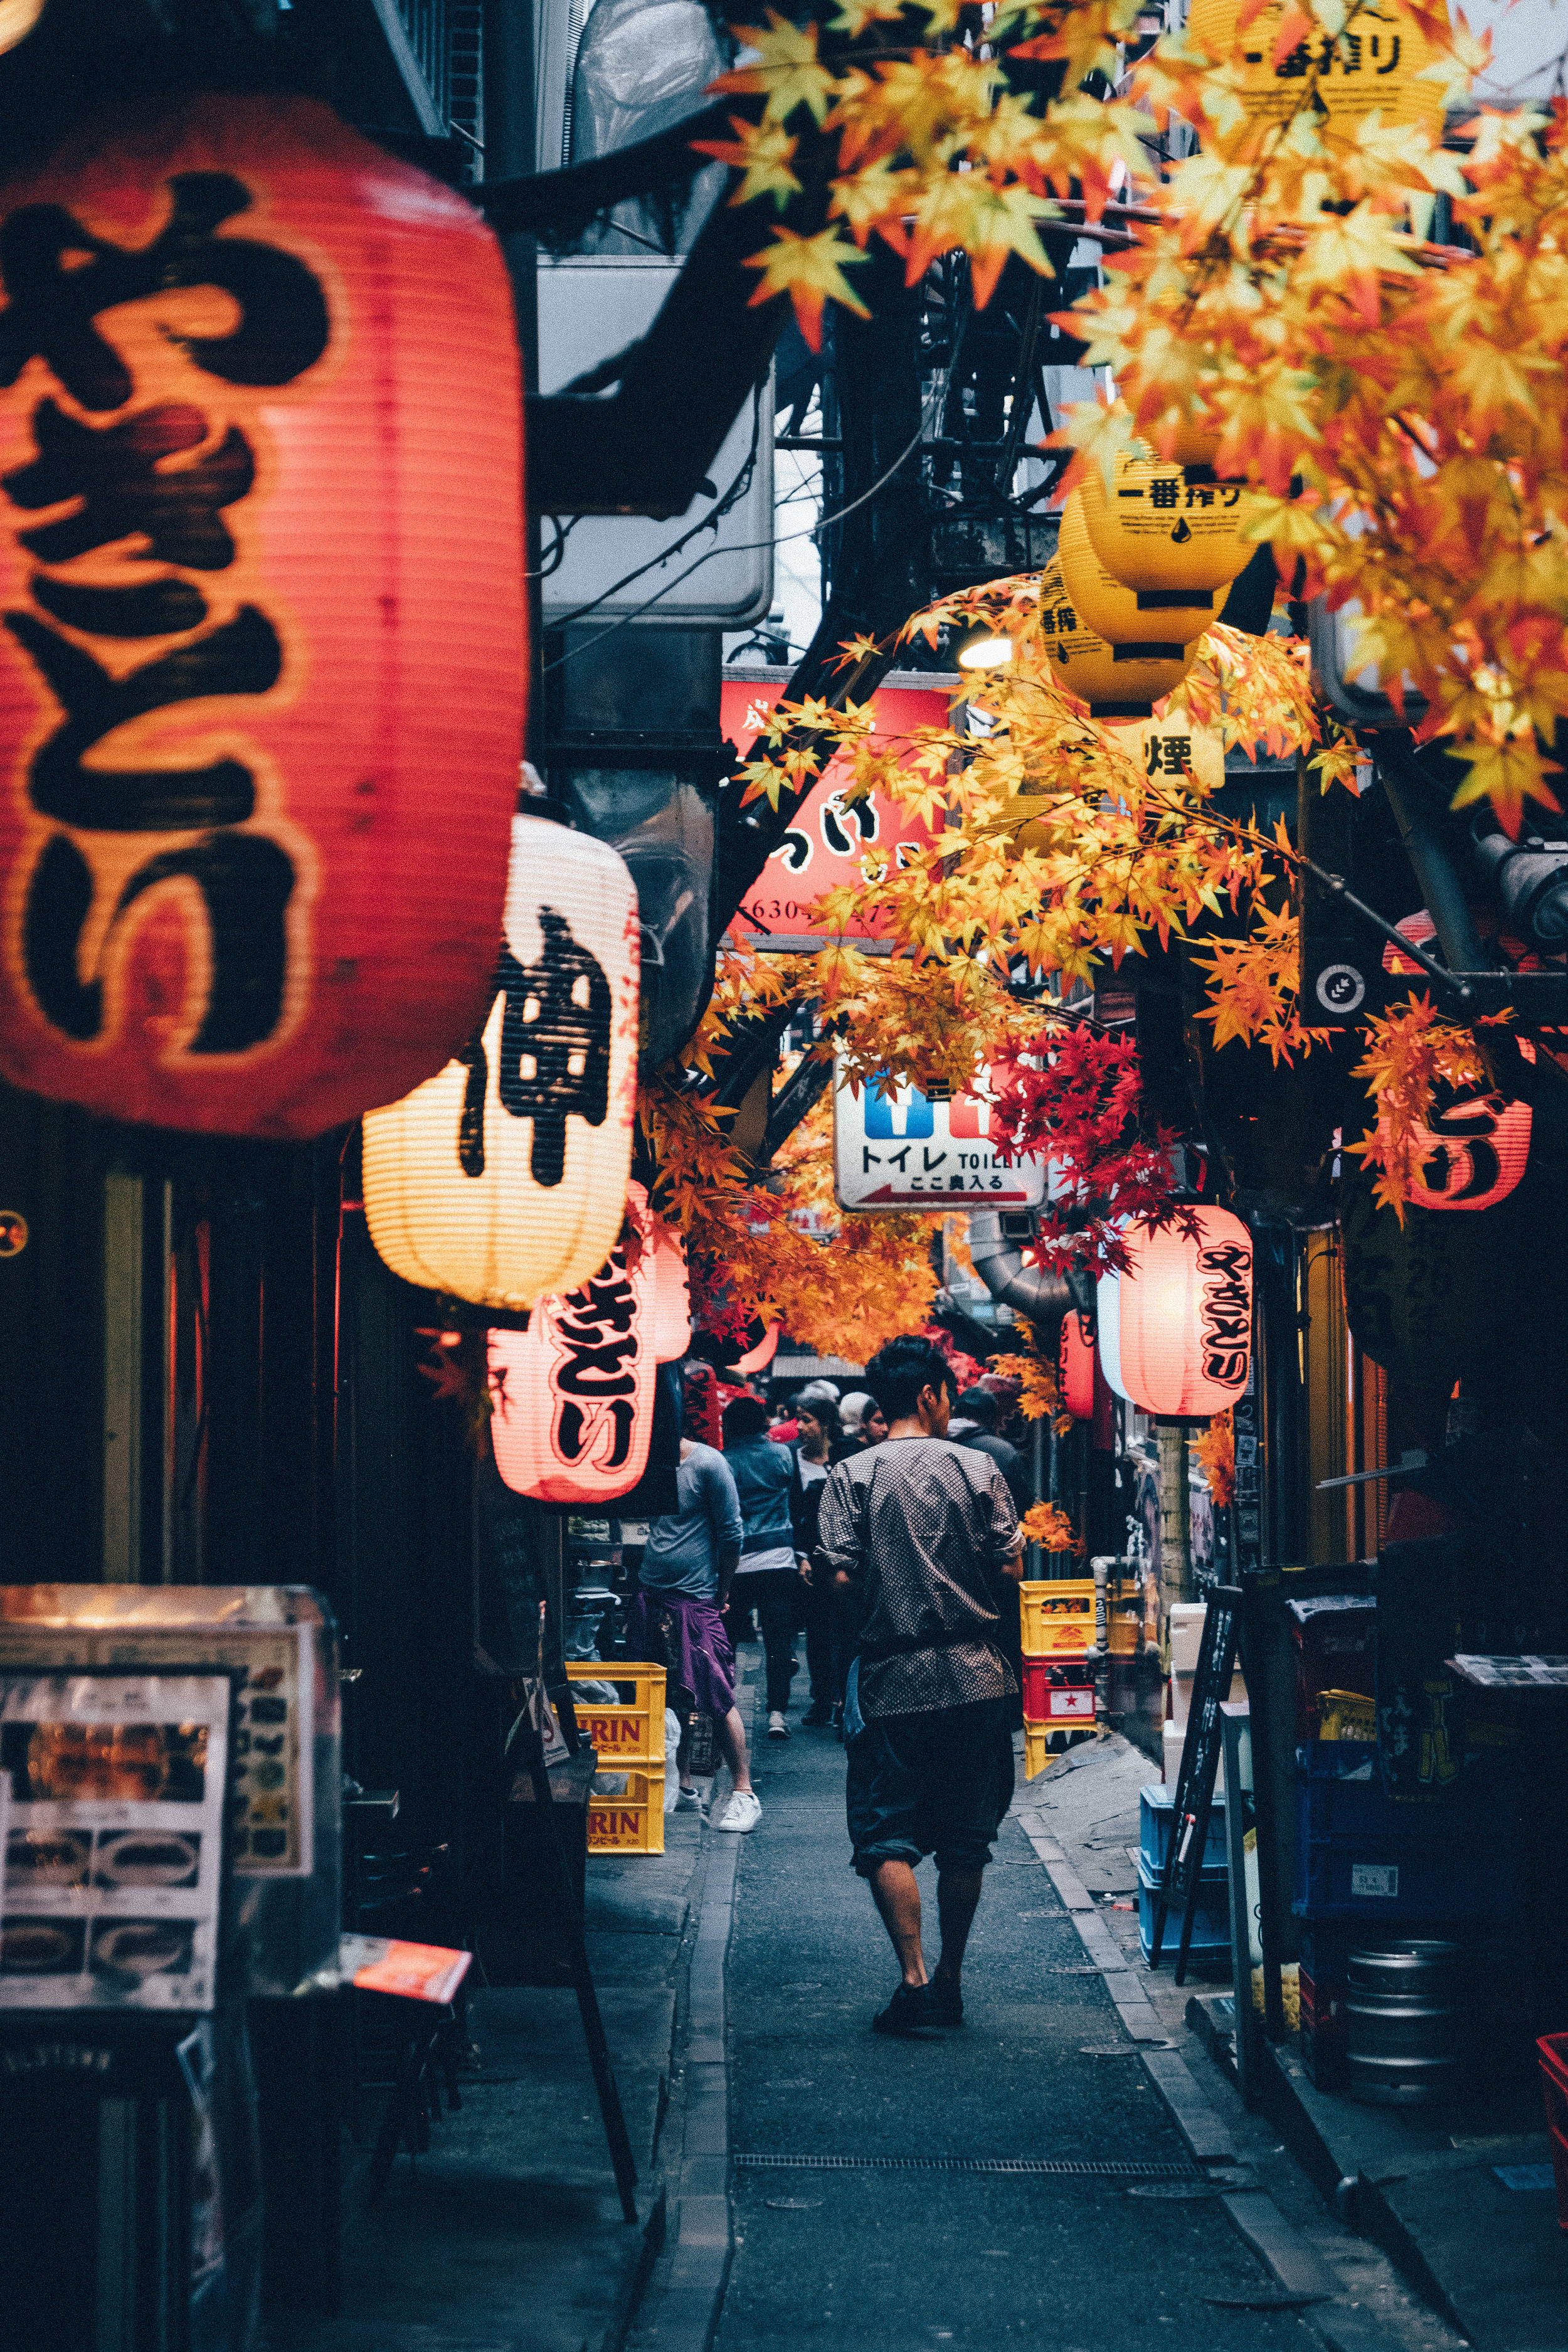 @vic_nkt - Tokyo, Japan